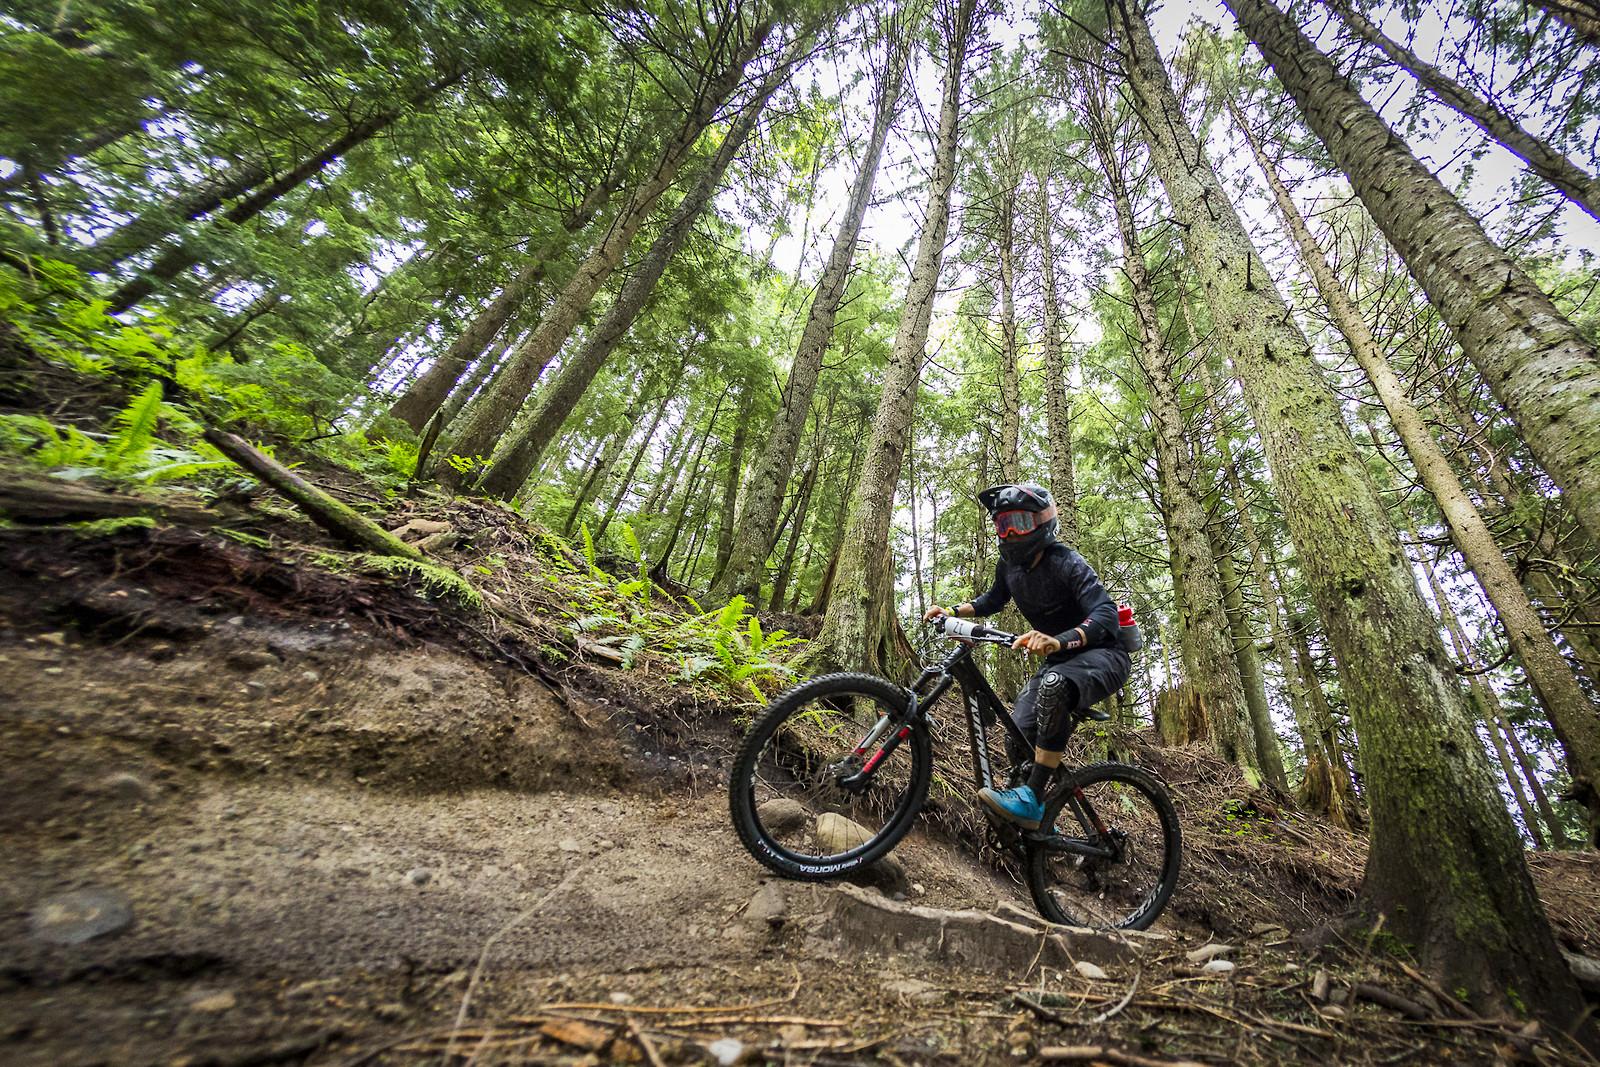 IMG 1583 - Beezkneez - Mountain Biking Pictures - Vital MTB